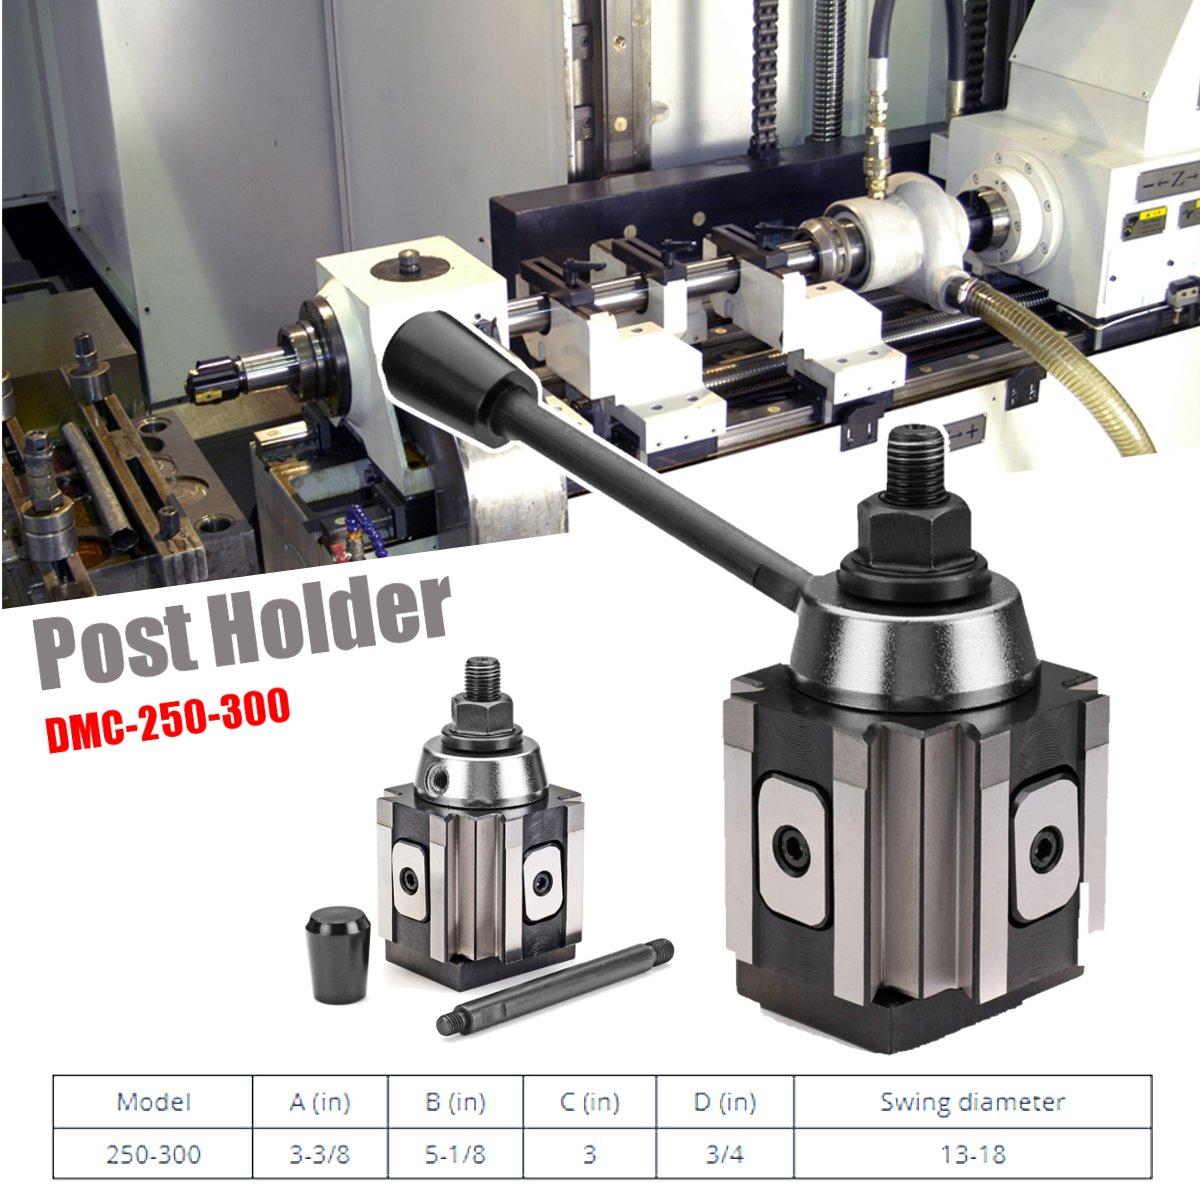 DMC-250-300 Piston Type Locking Tool Post Steel Quick Change Lathe Tool Holder New